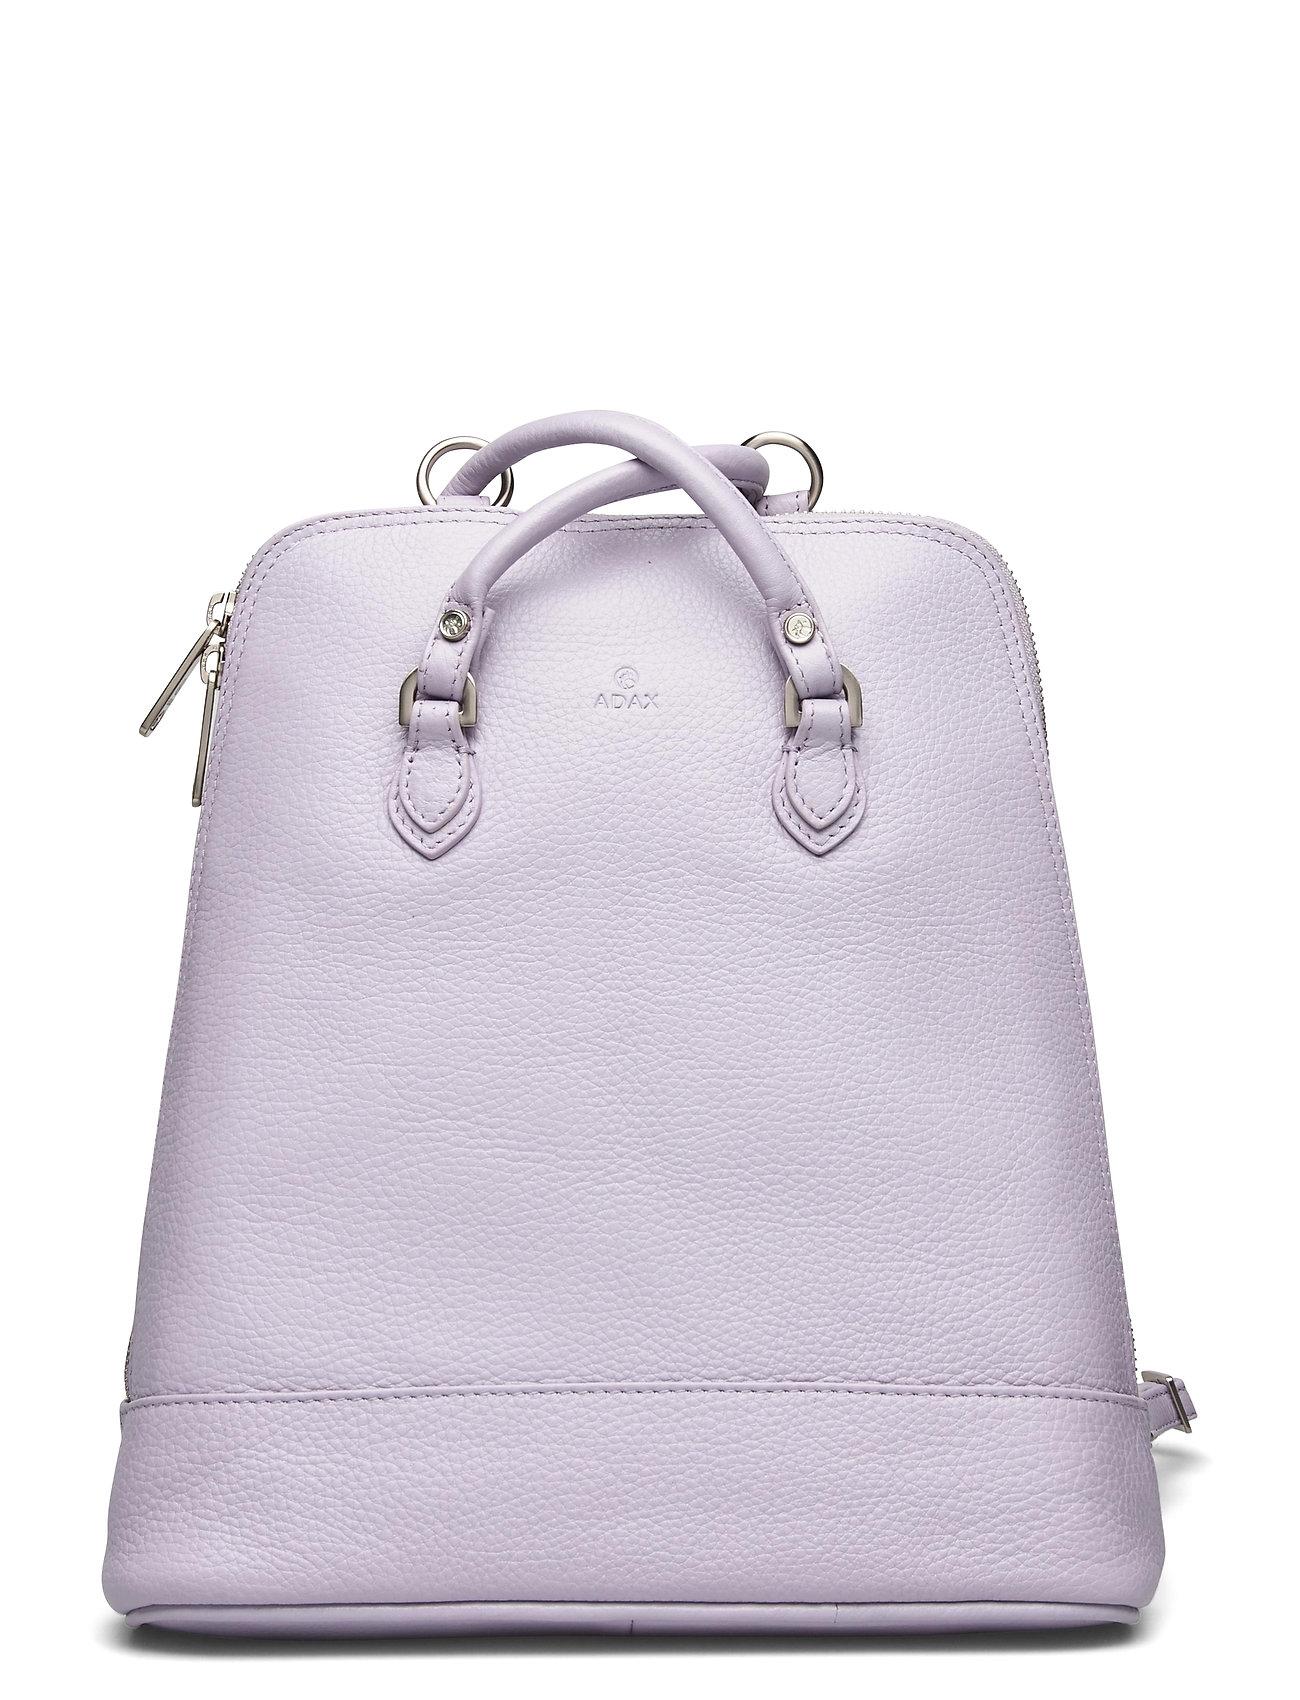 Adax Cormorano backpack Lina - LIGHT PURPLE